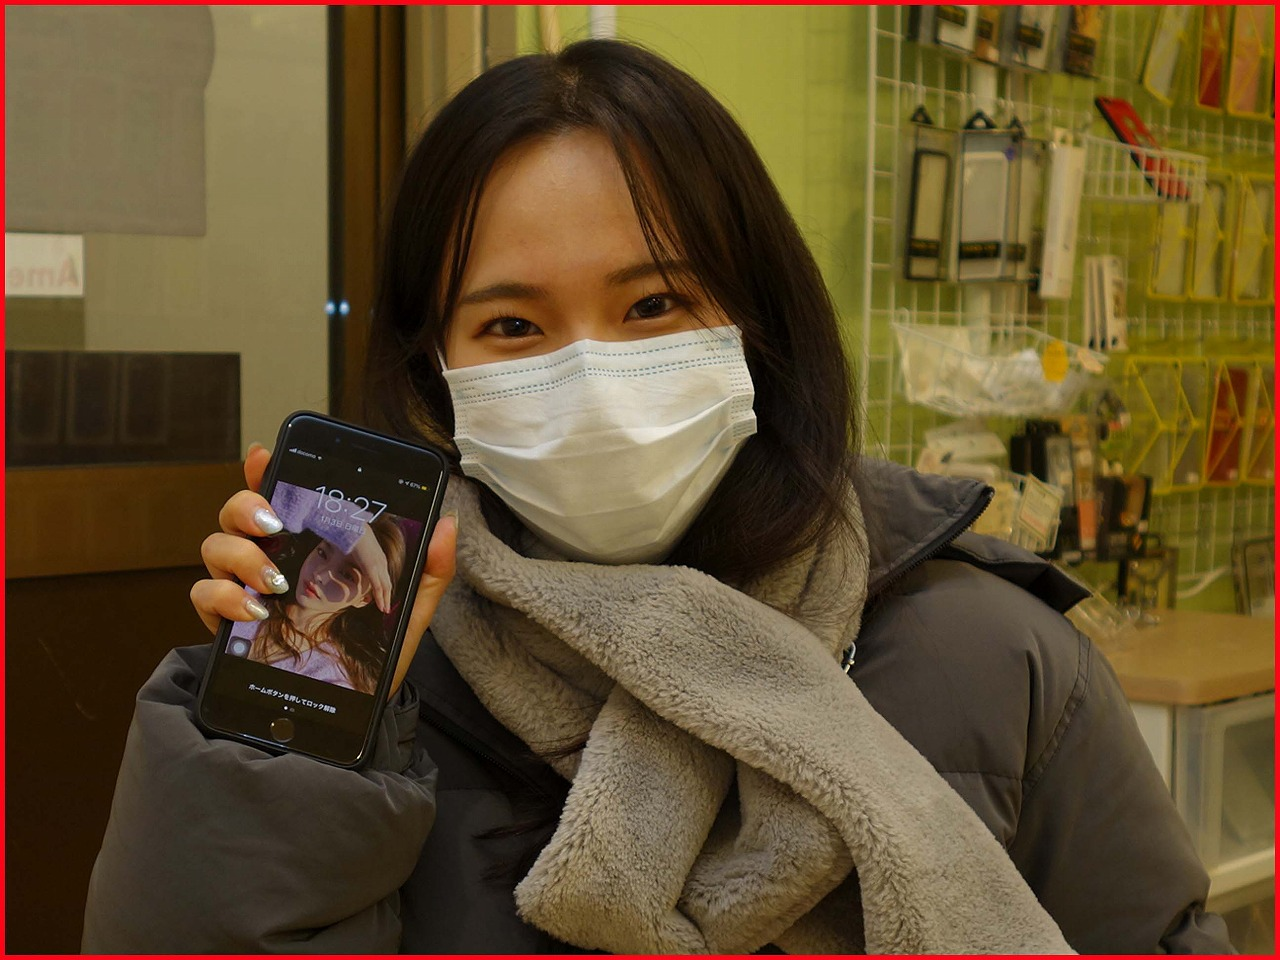 ☆iPhone8Plusのガラス交換修理に岩倉市よりご来店!アイフォン修理のクイック名古屋